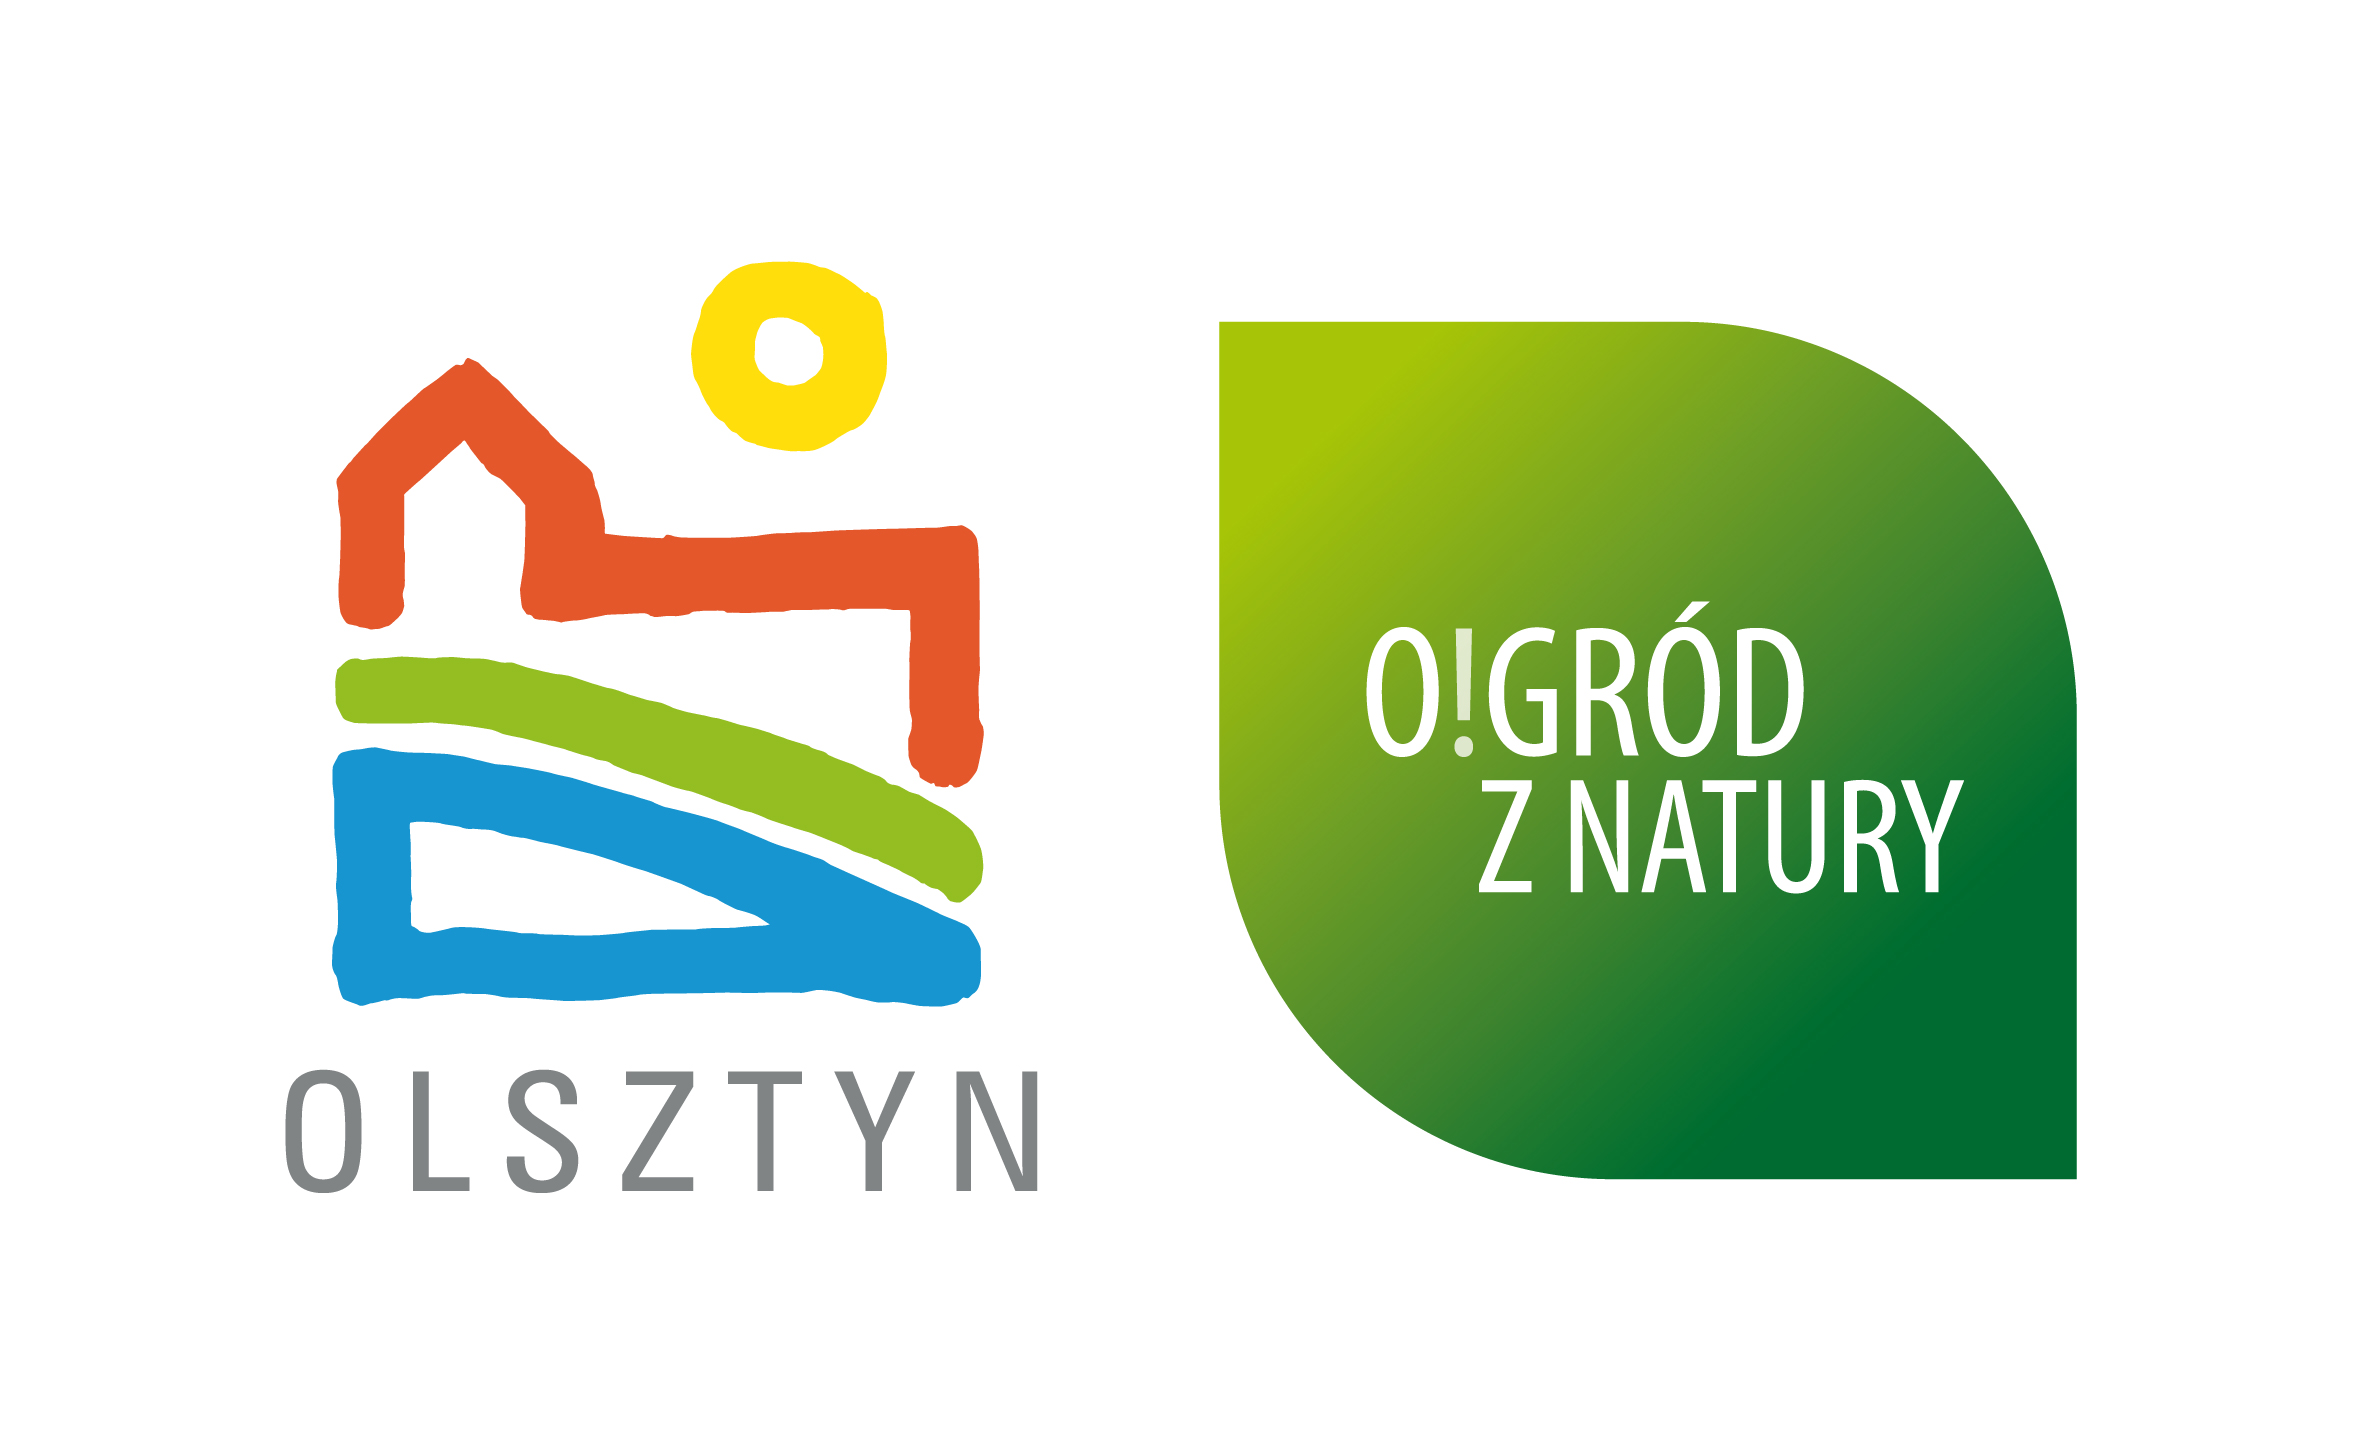 https://m.wmwm.pl/2016/06/orig/logo-z-listkiem-5327.jpg